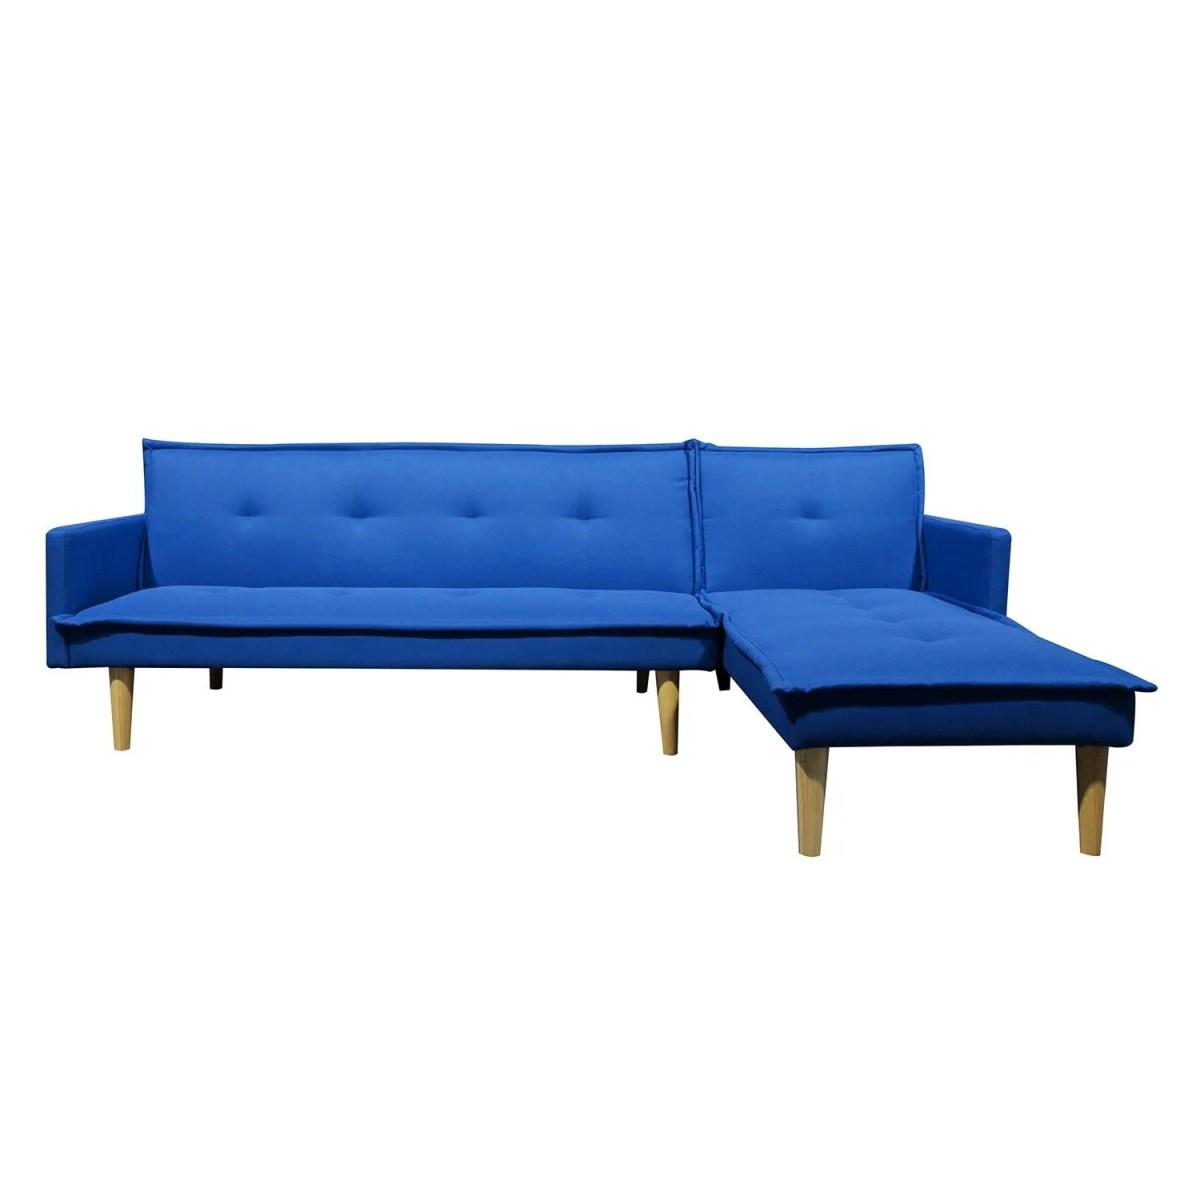 sala esquinada sofá cama independencia azul 4